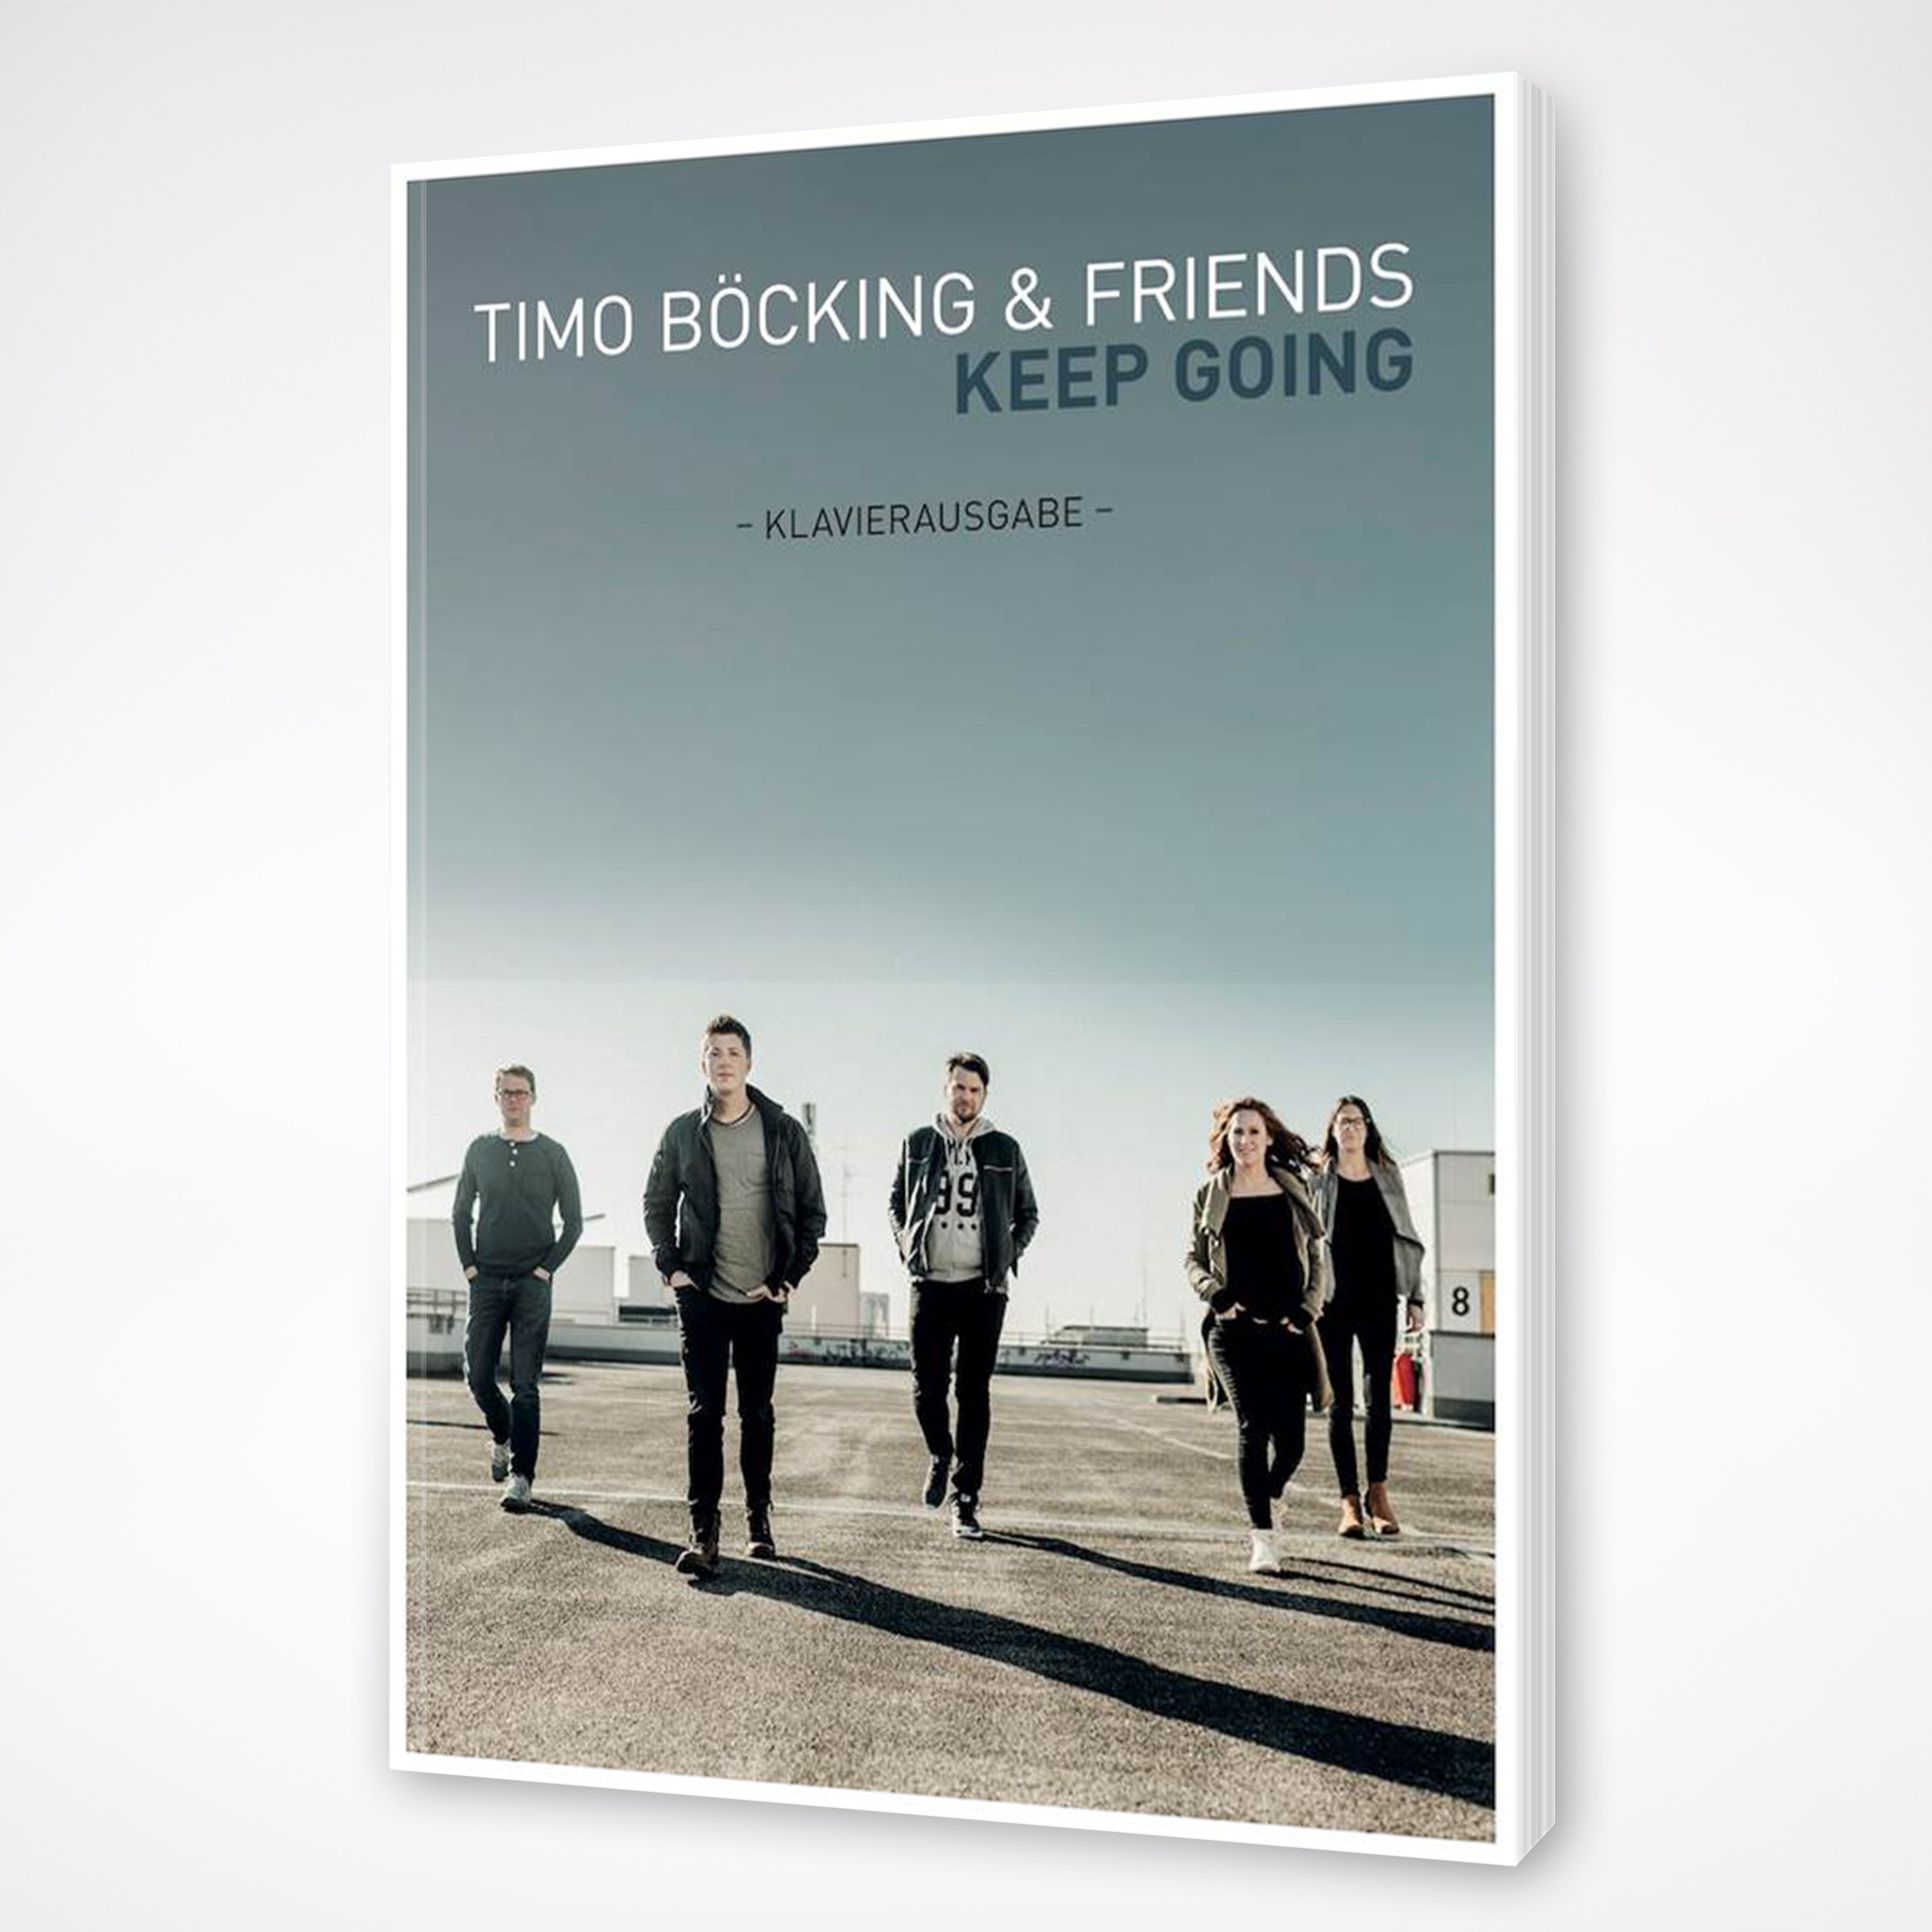 Timo Böcking & Friends - Keep going Klavierausgabe